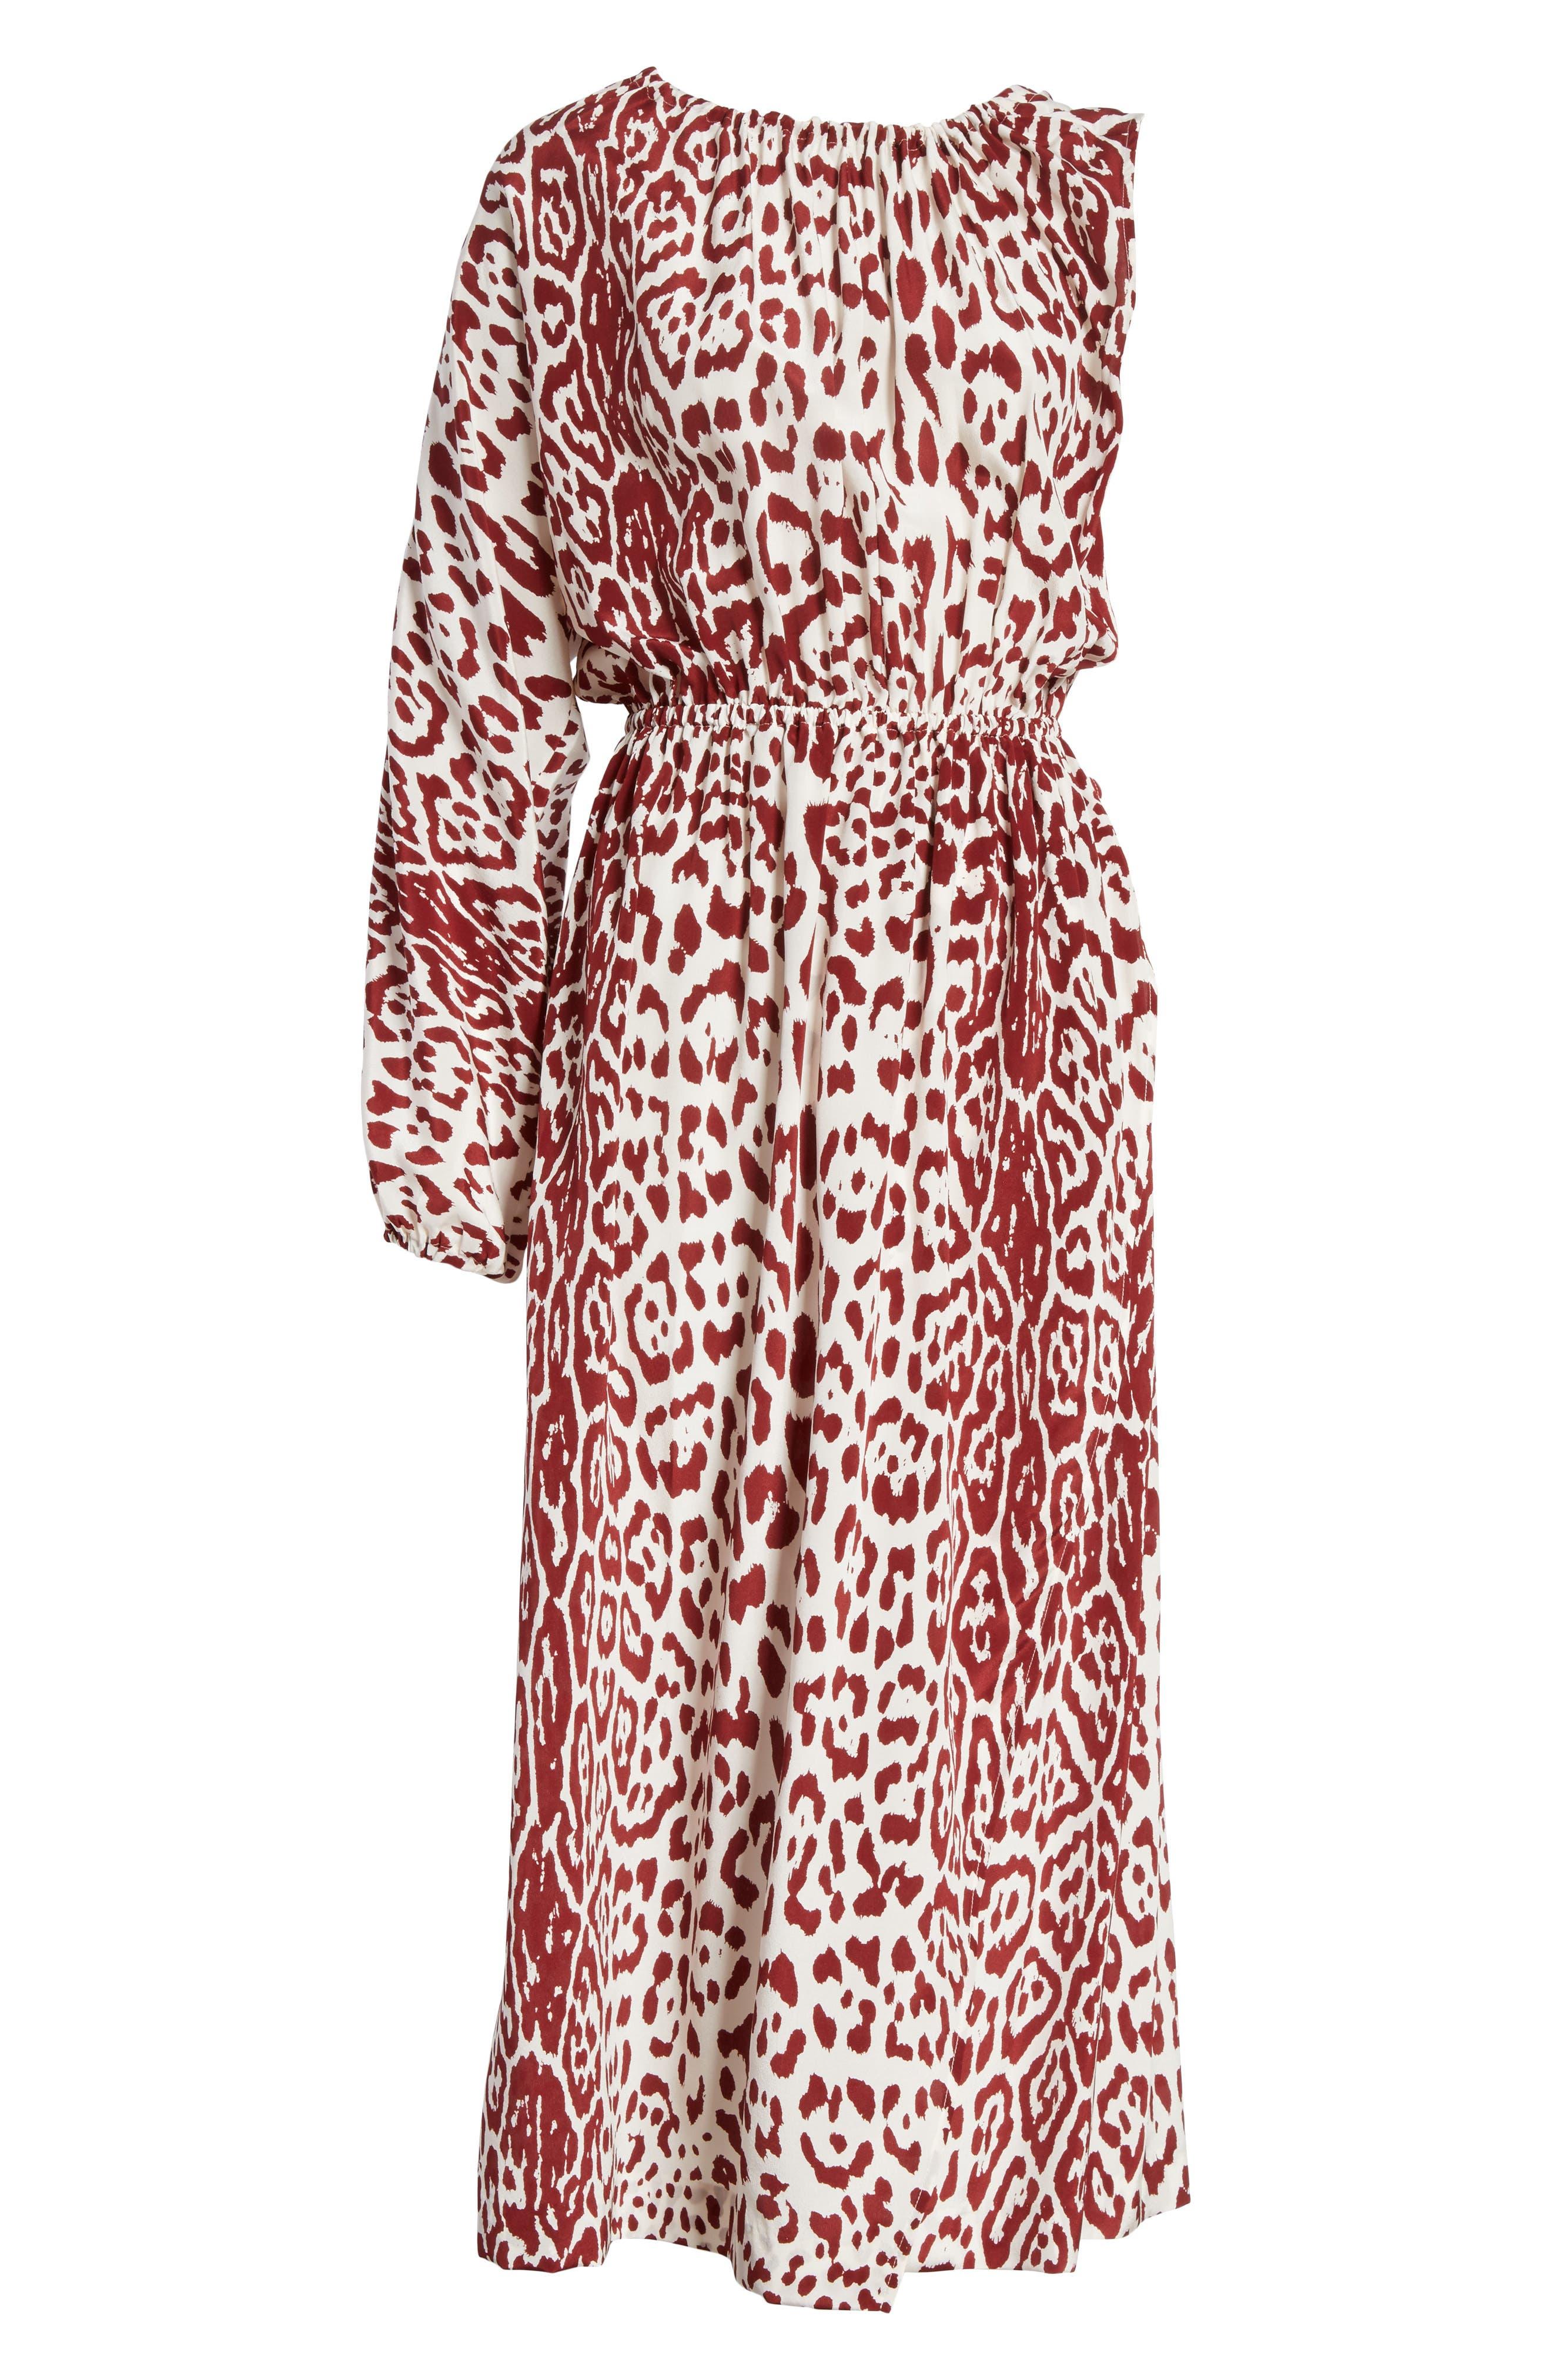 Leopard Print Silk Midi Dress,                             Alternate thumbnail 6, color,                             Crimson Leopard